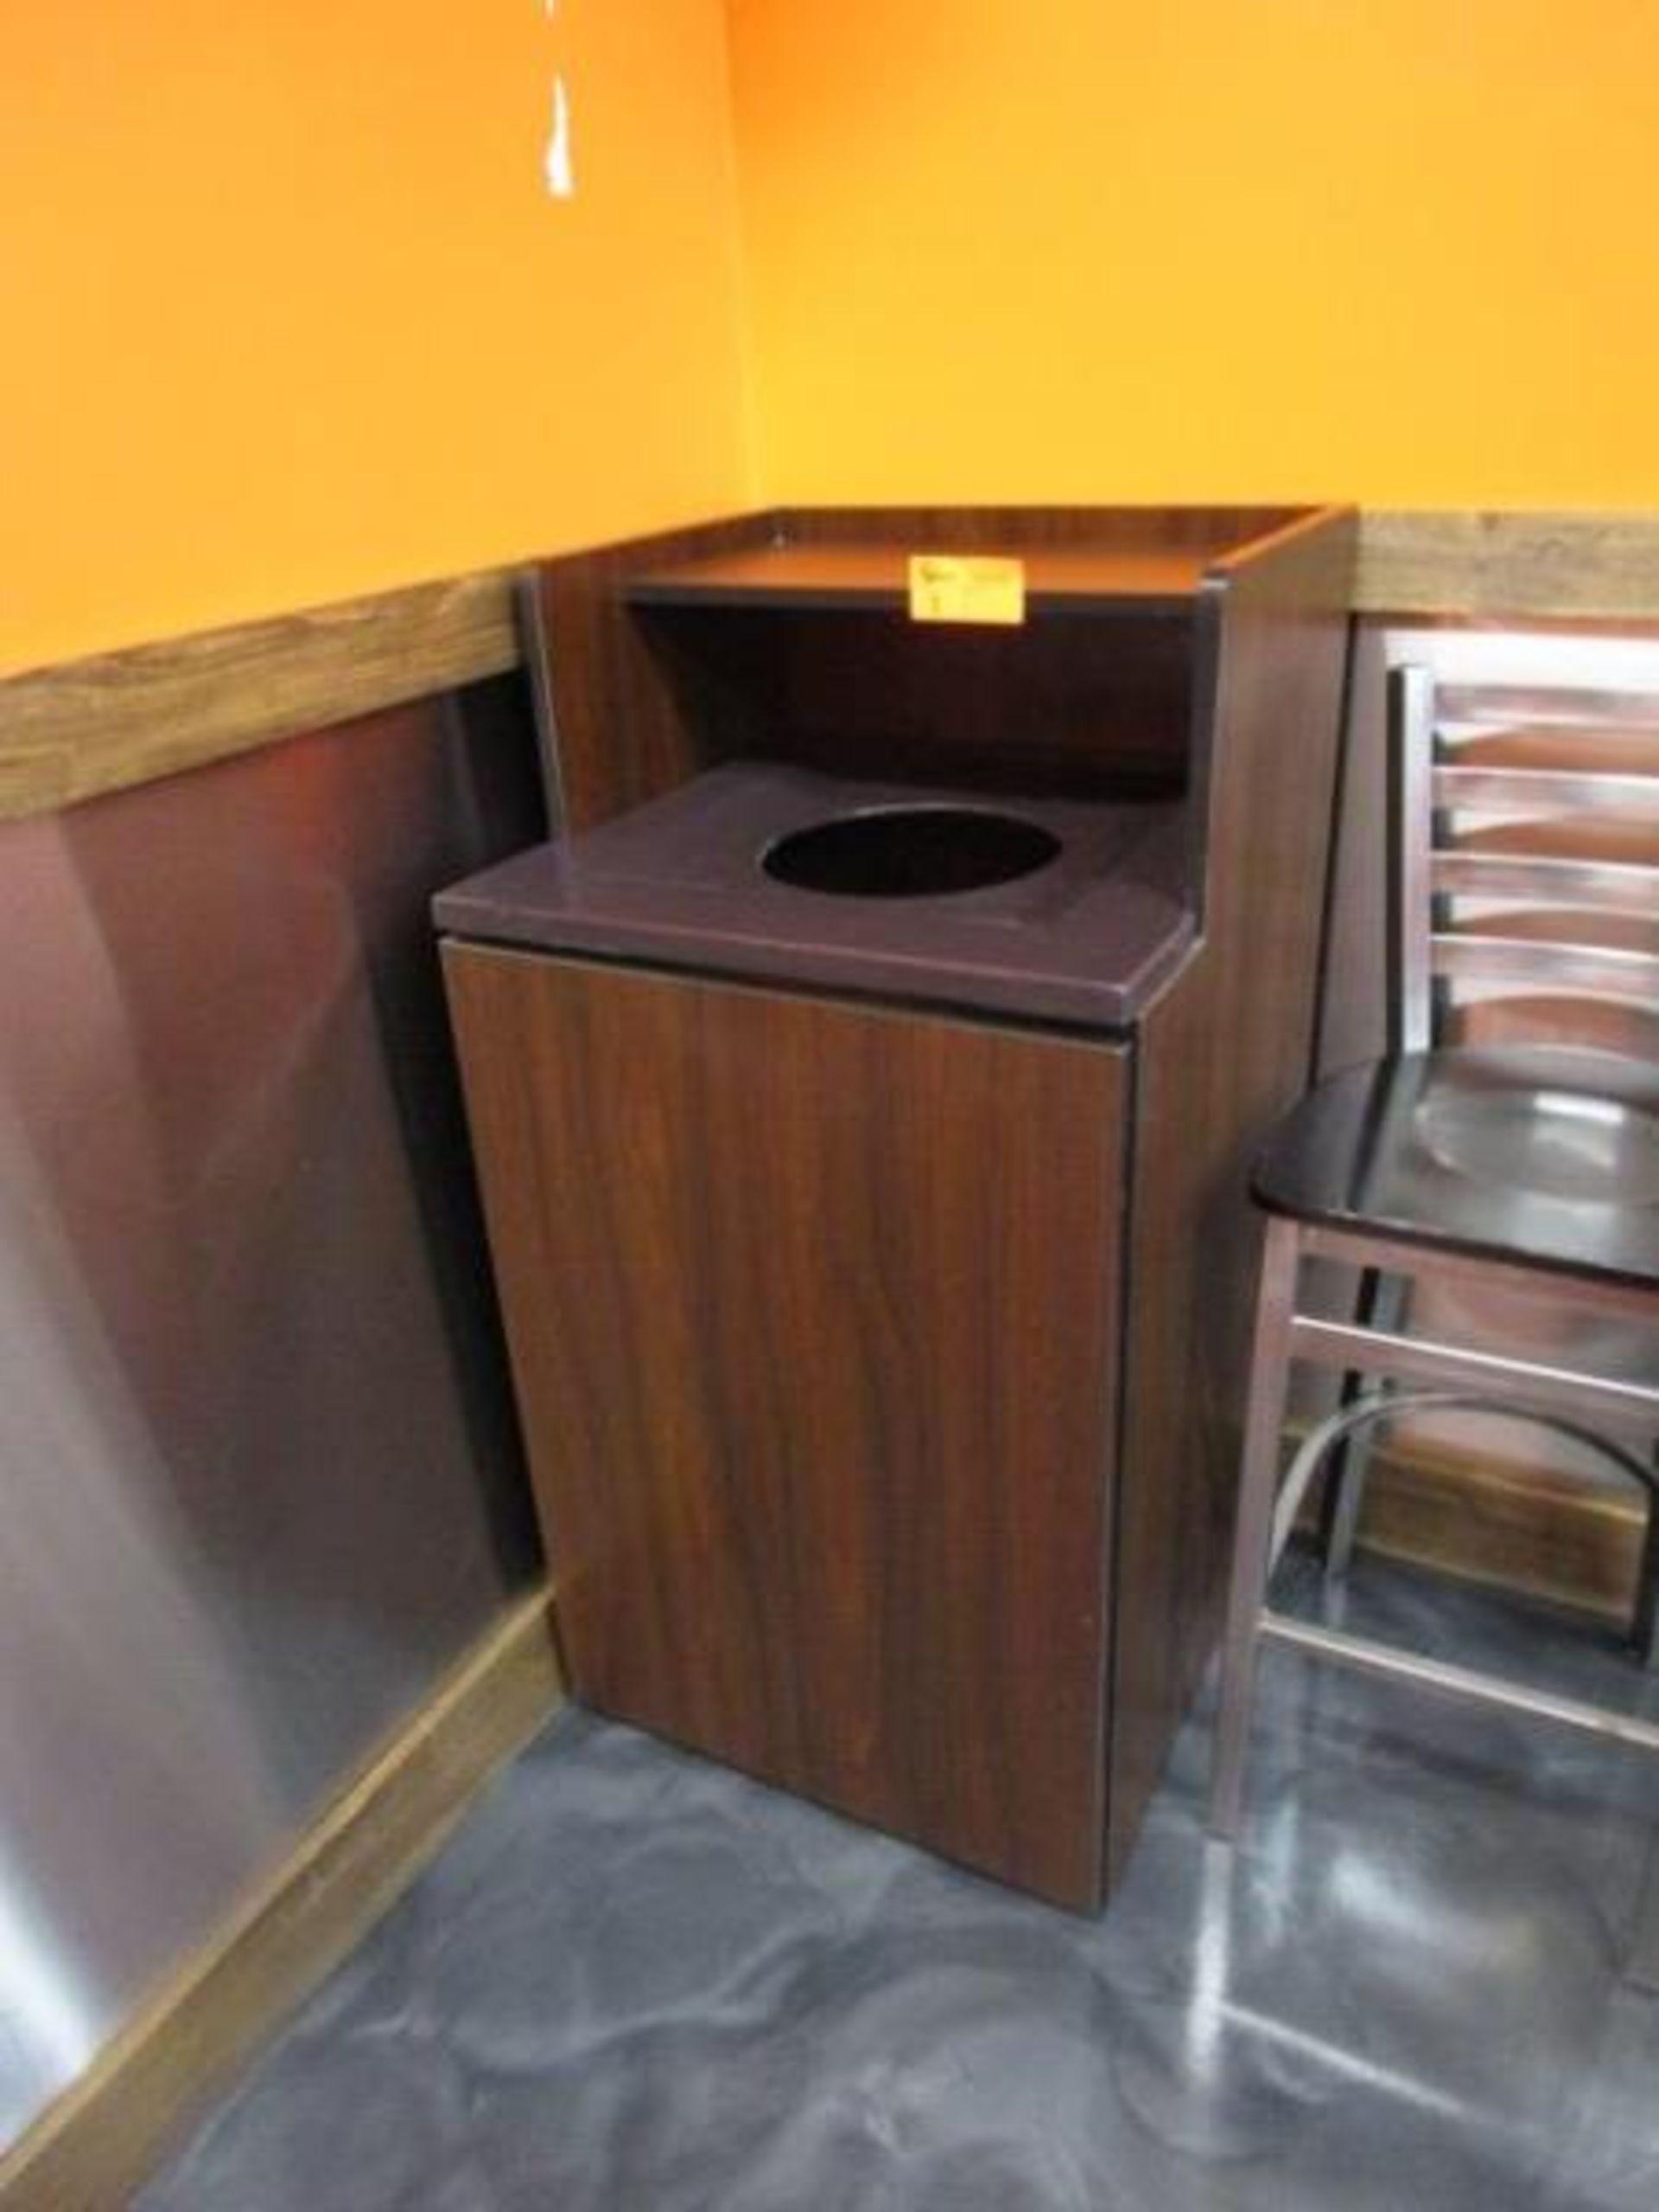 Lot 8 - Laminate Trash Receptacle w/ Rubbermaid Plastic Can